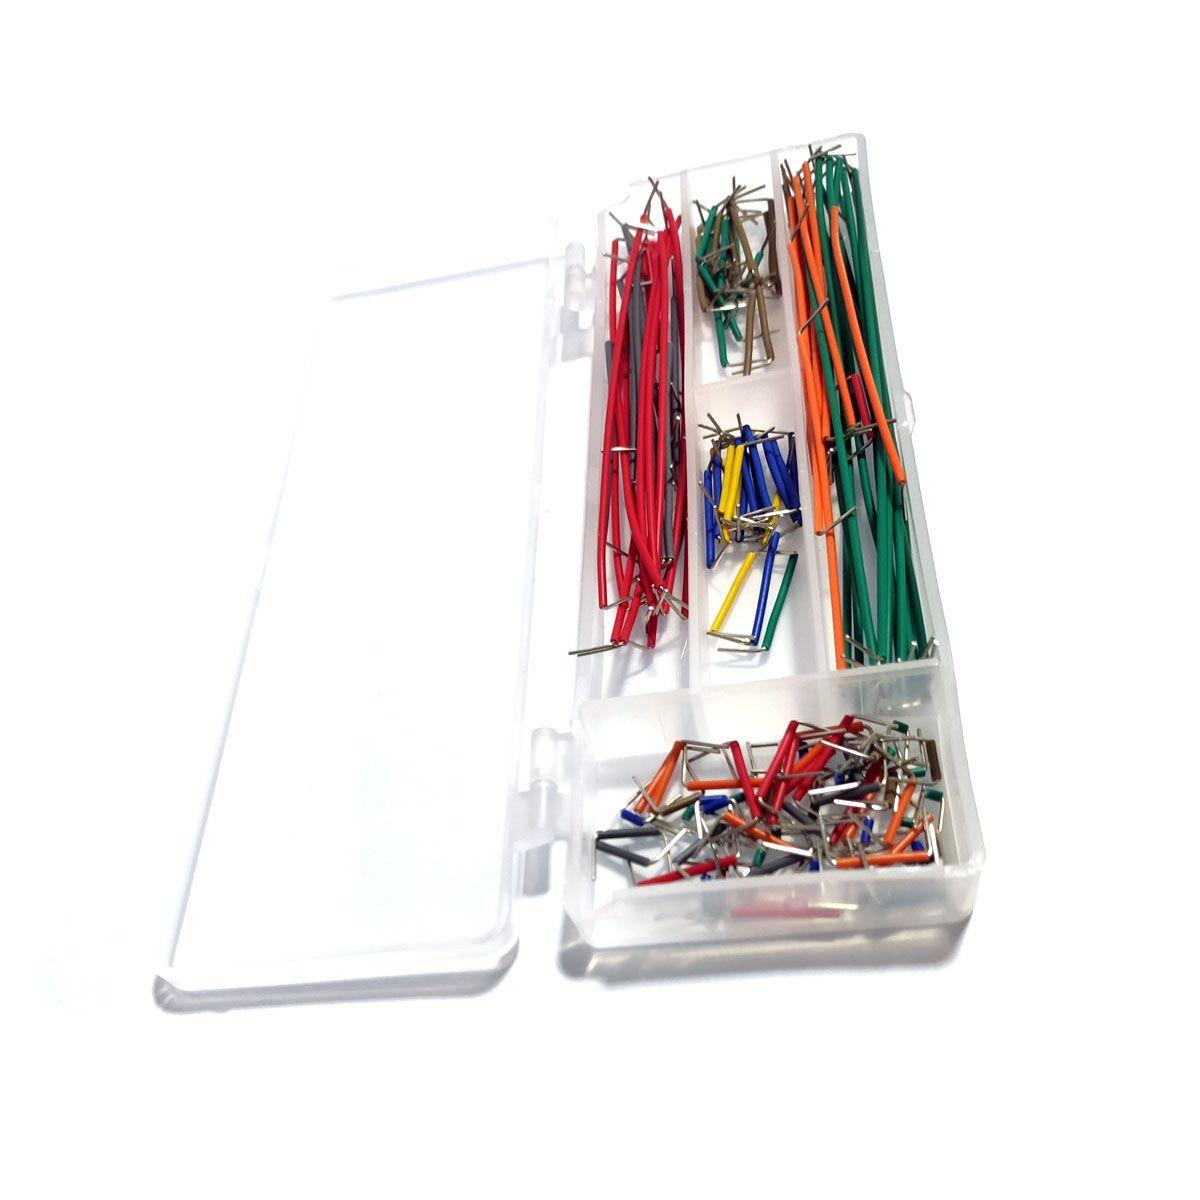 Kit com 140 Jumpers / Cabos AWG Tipo U para Protoboard